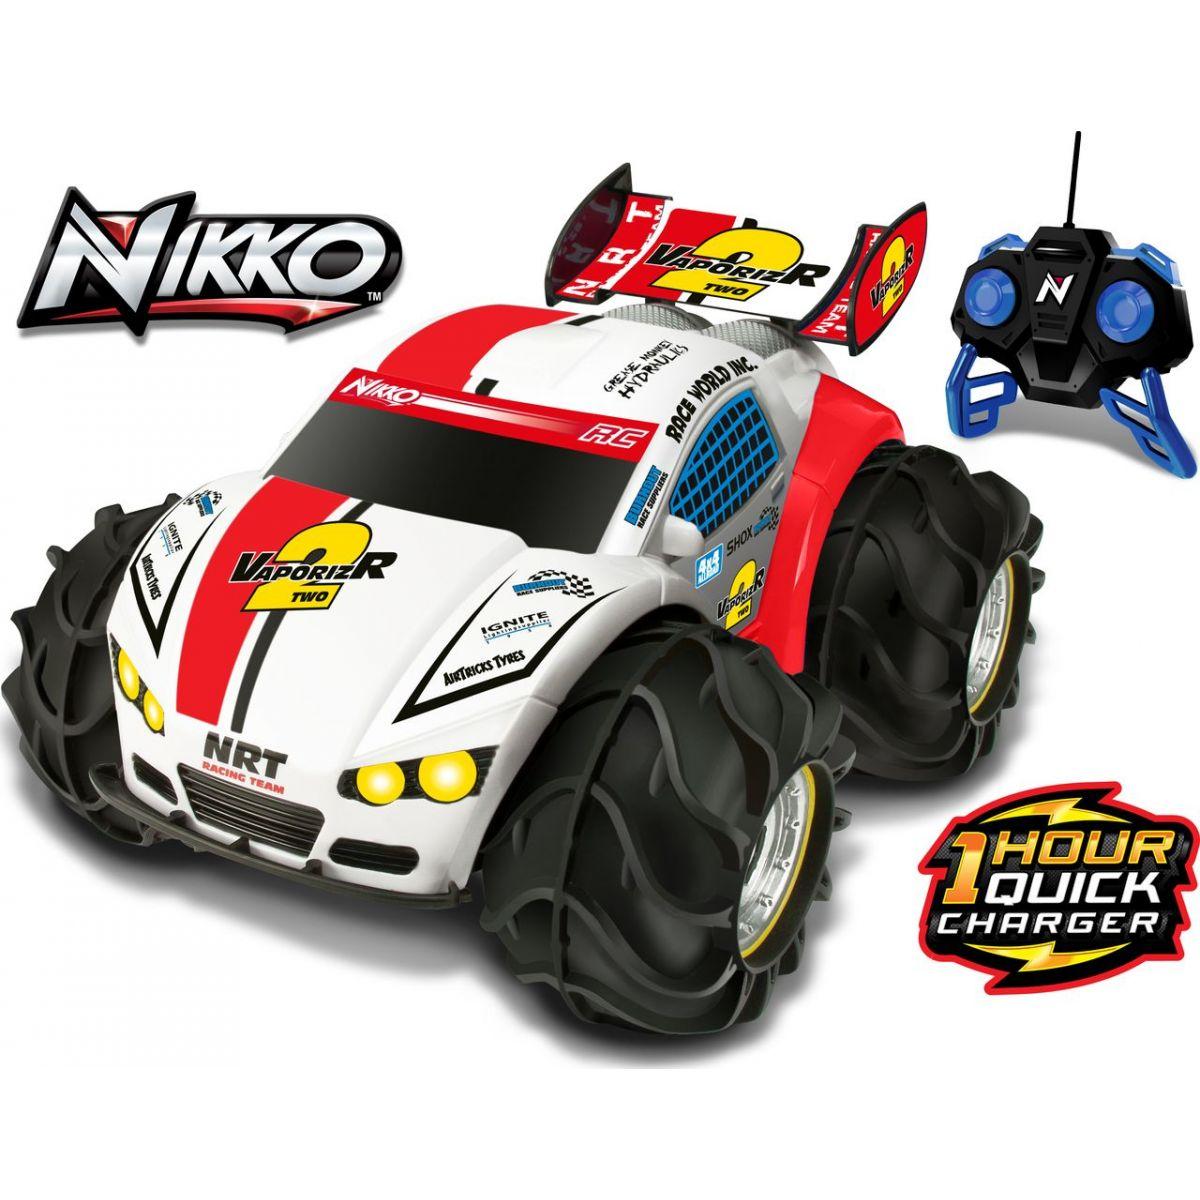 Nikko RC Auto VaporizR 2 Pro Červená #2